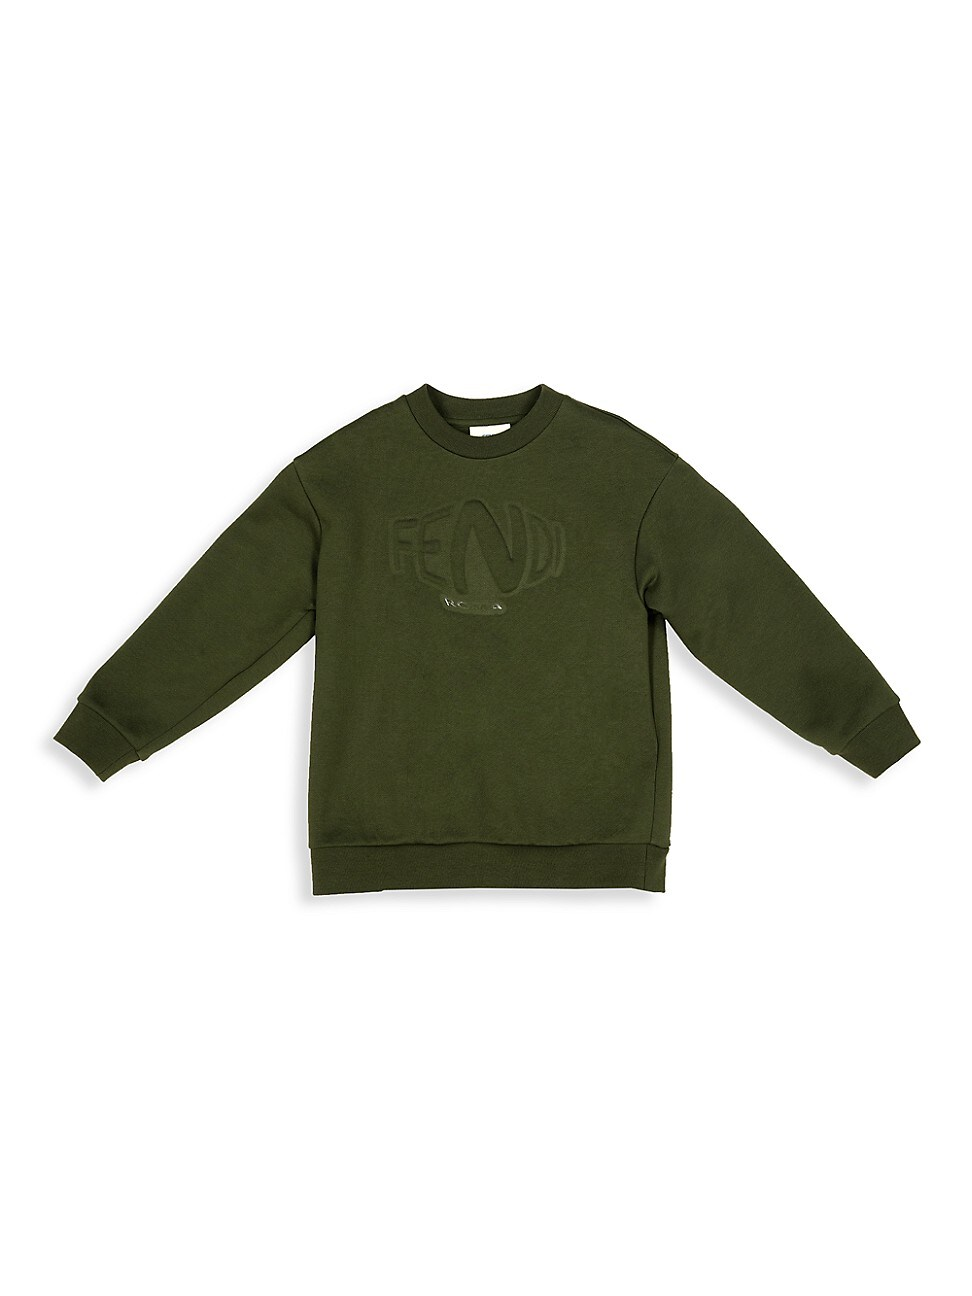 Fendi Little Kid's & Kid's Logo Embossed Sweatshirt In Green